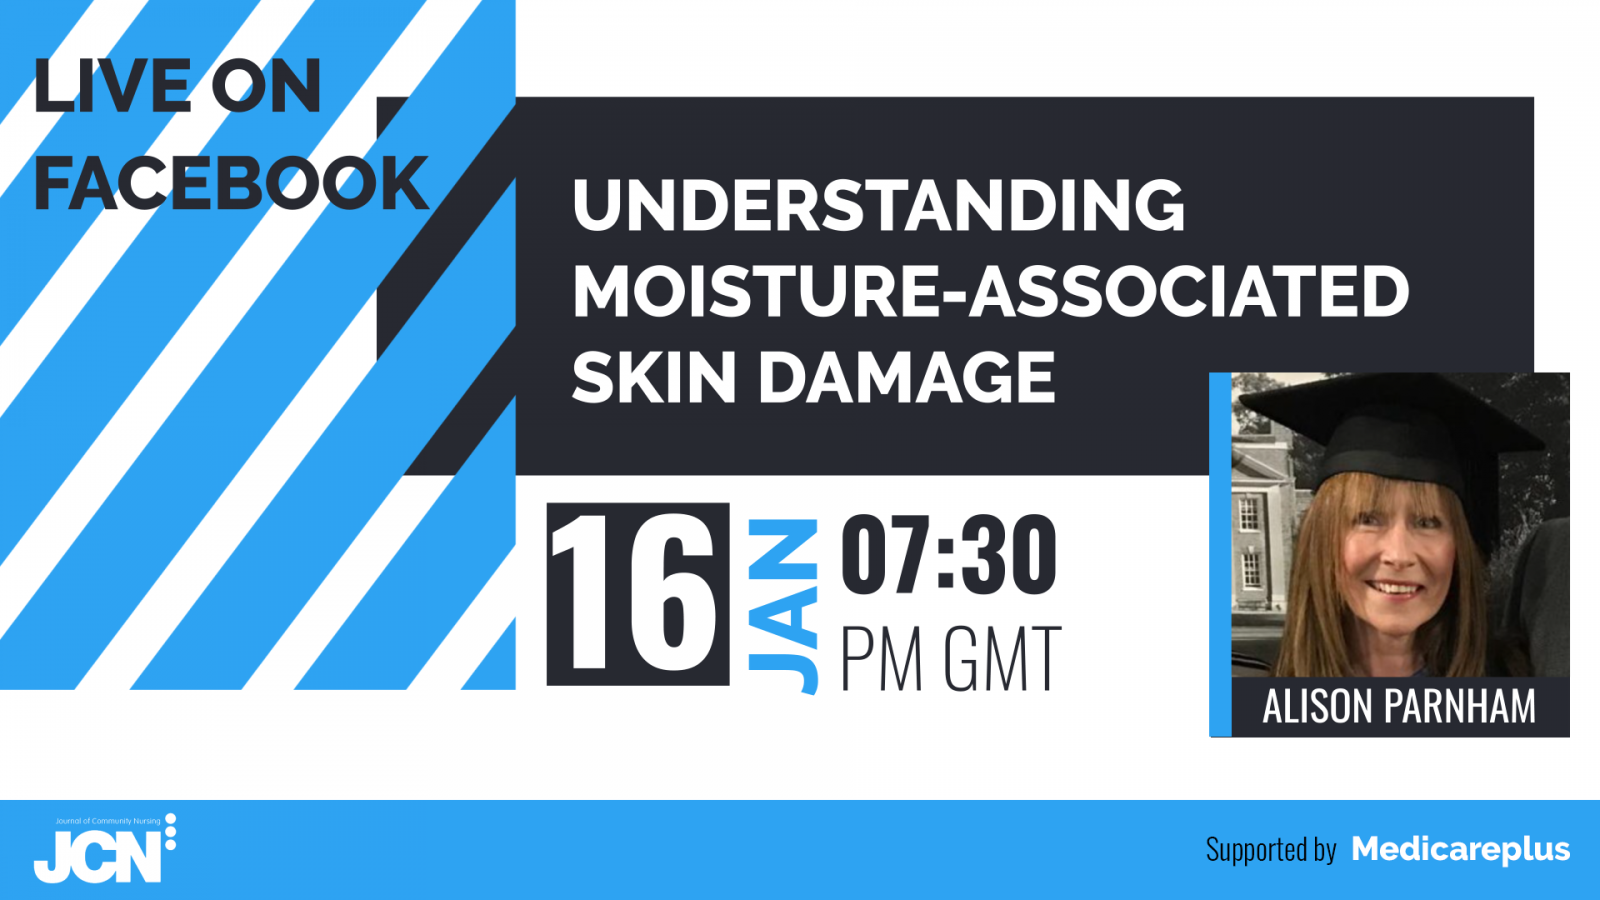 Facebook Live: Understanding moisture-associated skin damage